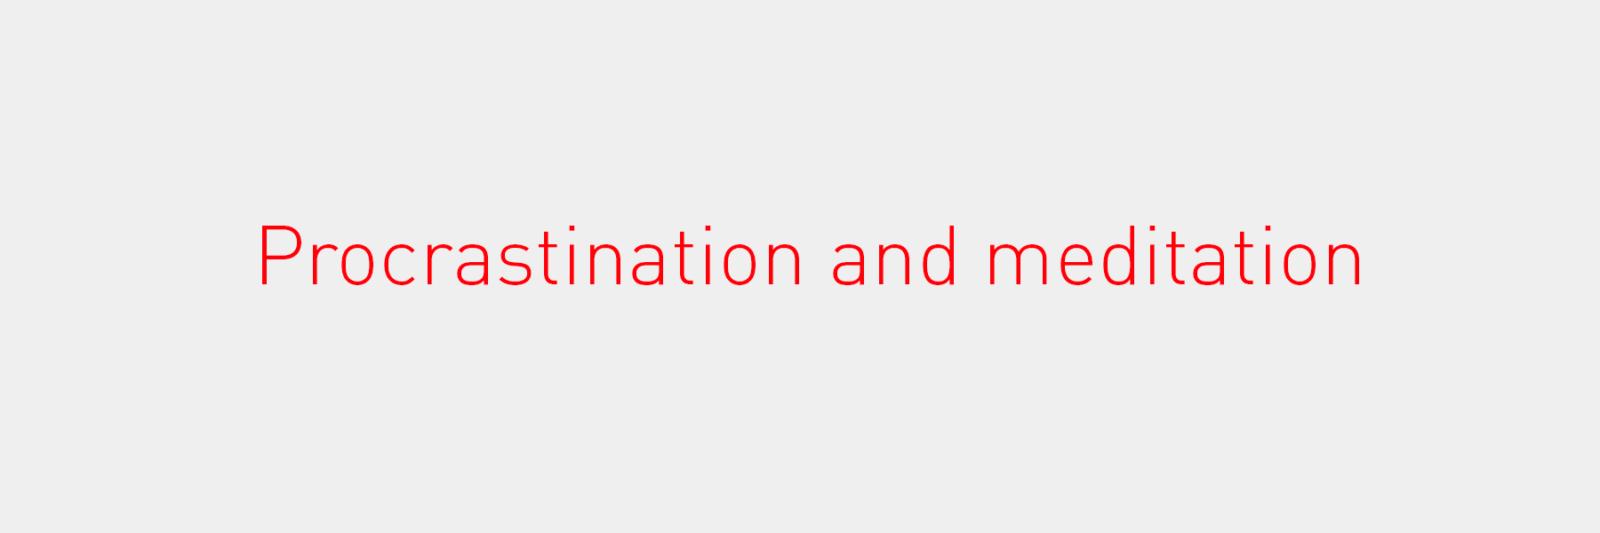 Procrastination and meditation